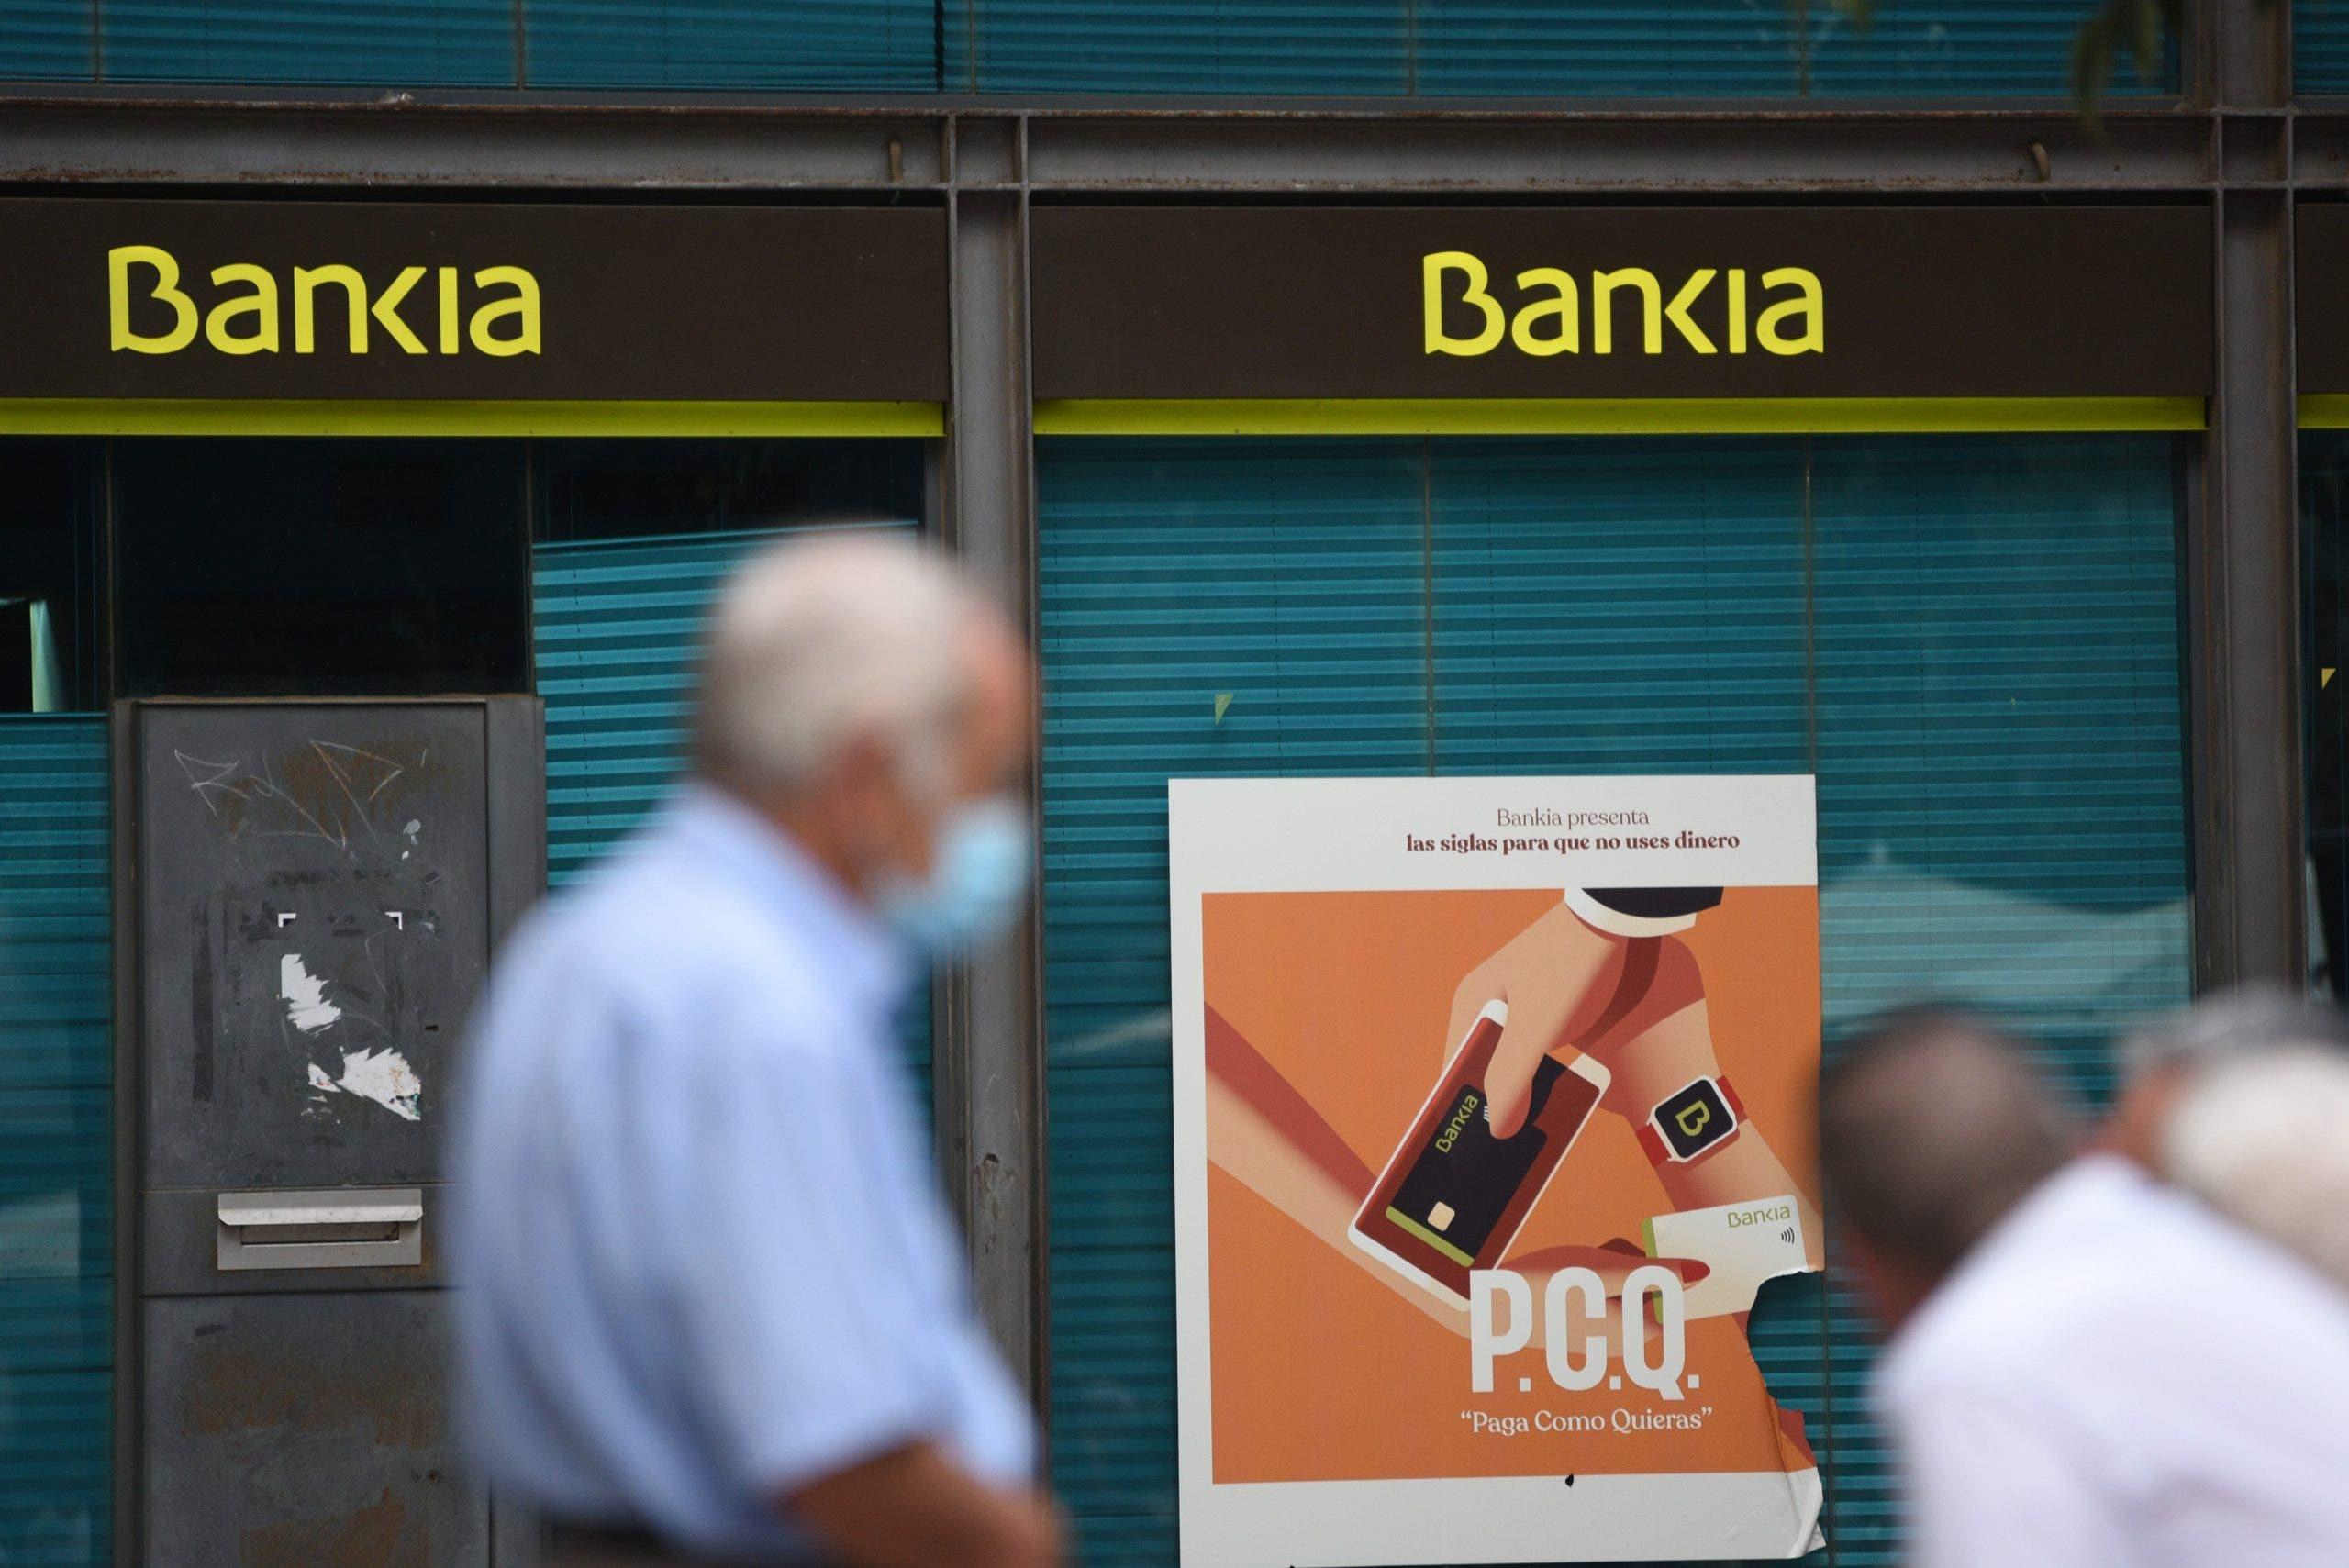 Bankia disappears into CaixaBank